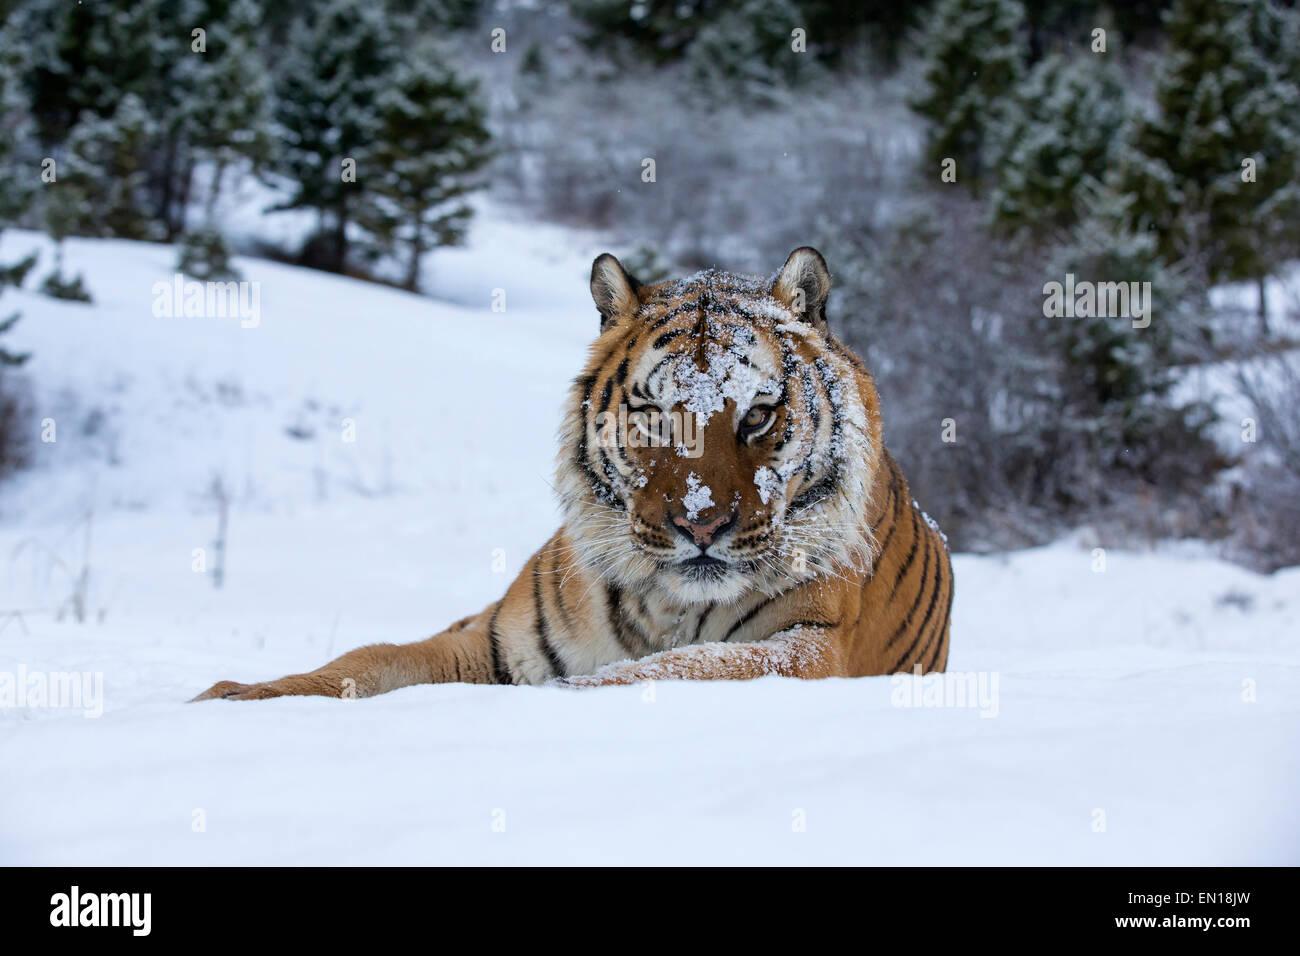 Tigre de Sibérie (Panthera tigris altaica) adulte assis dans la neige Photo Stock